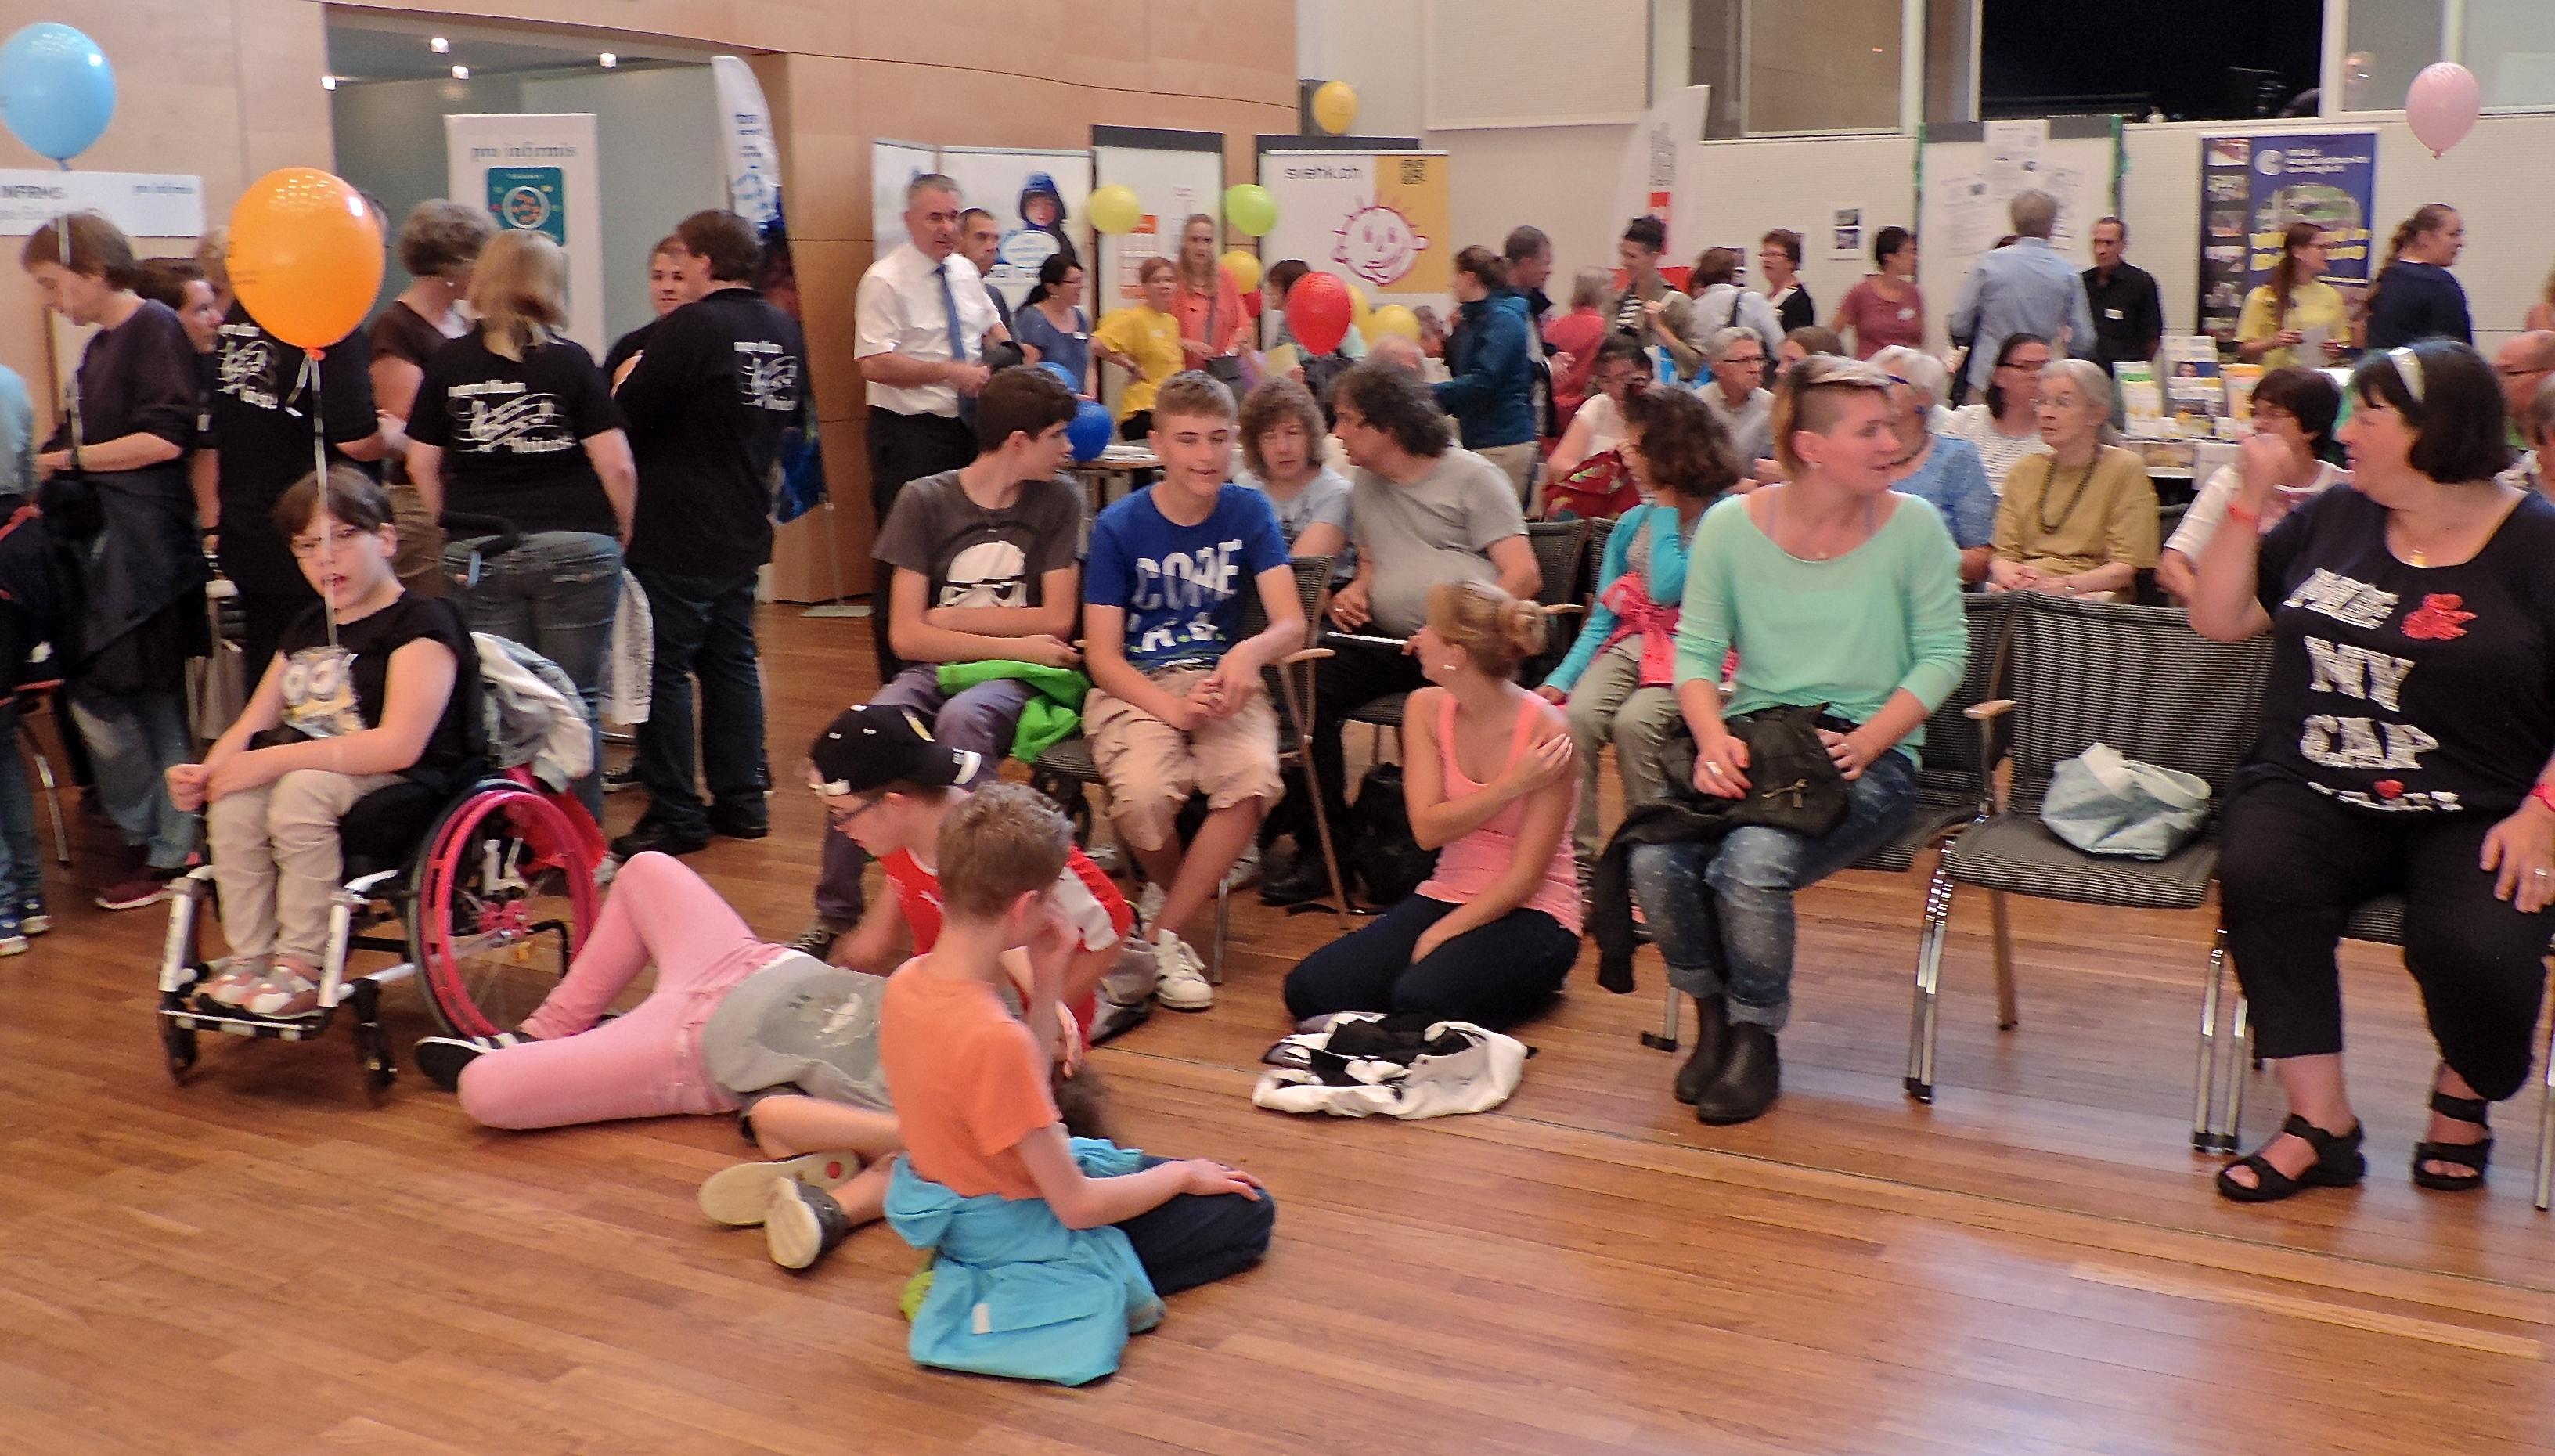 Stellungnahme Integrative Schulung im Kanton Aargau | KABO